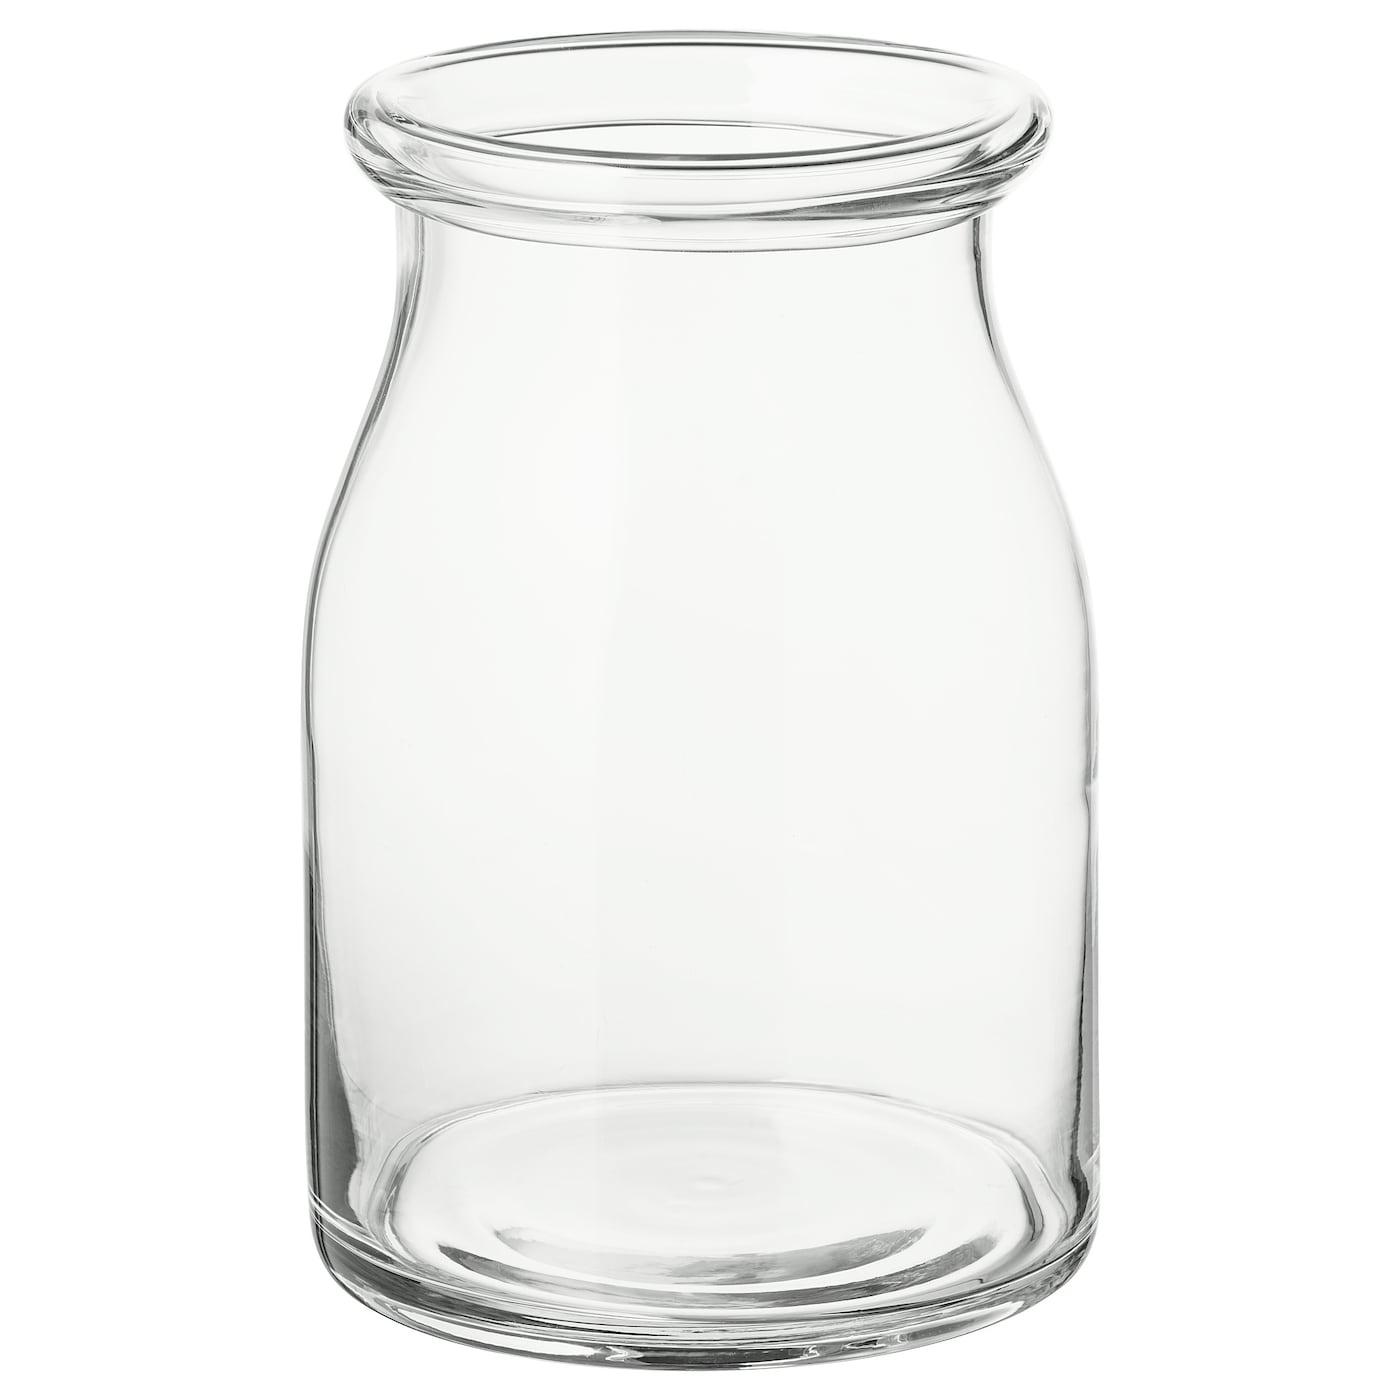 Beg 196 Rlig Vase Clear Glass Ikea